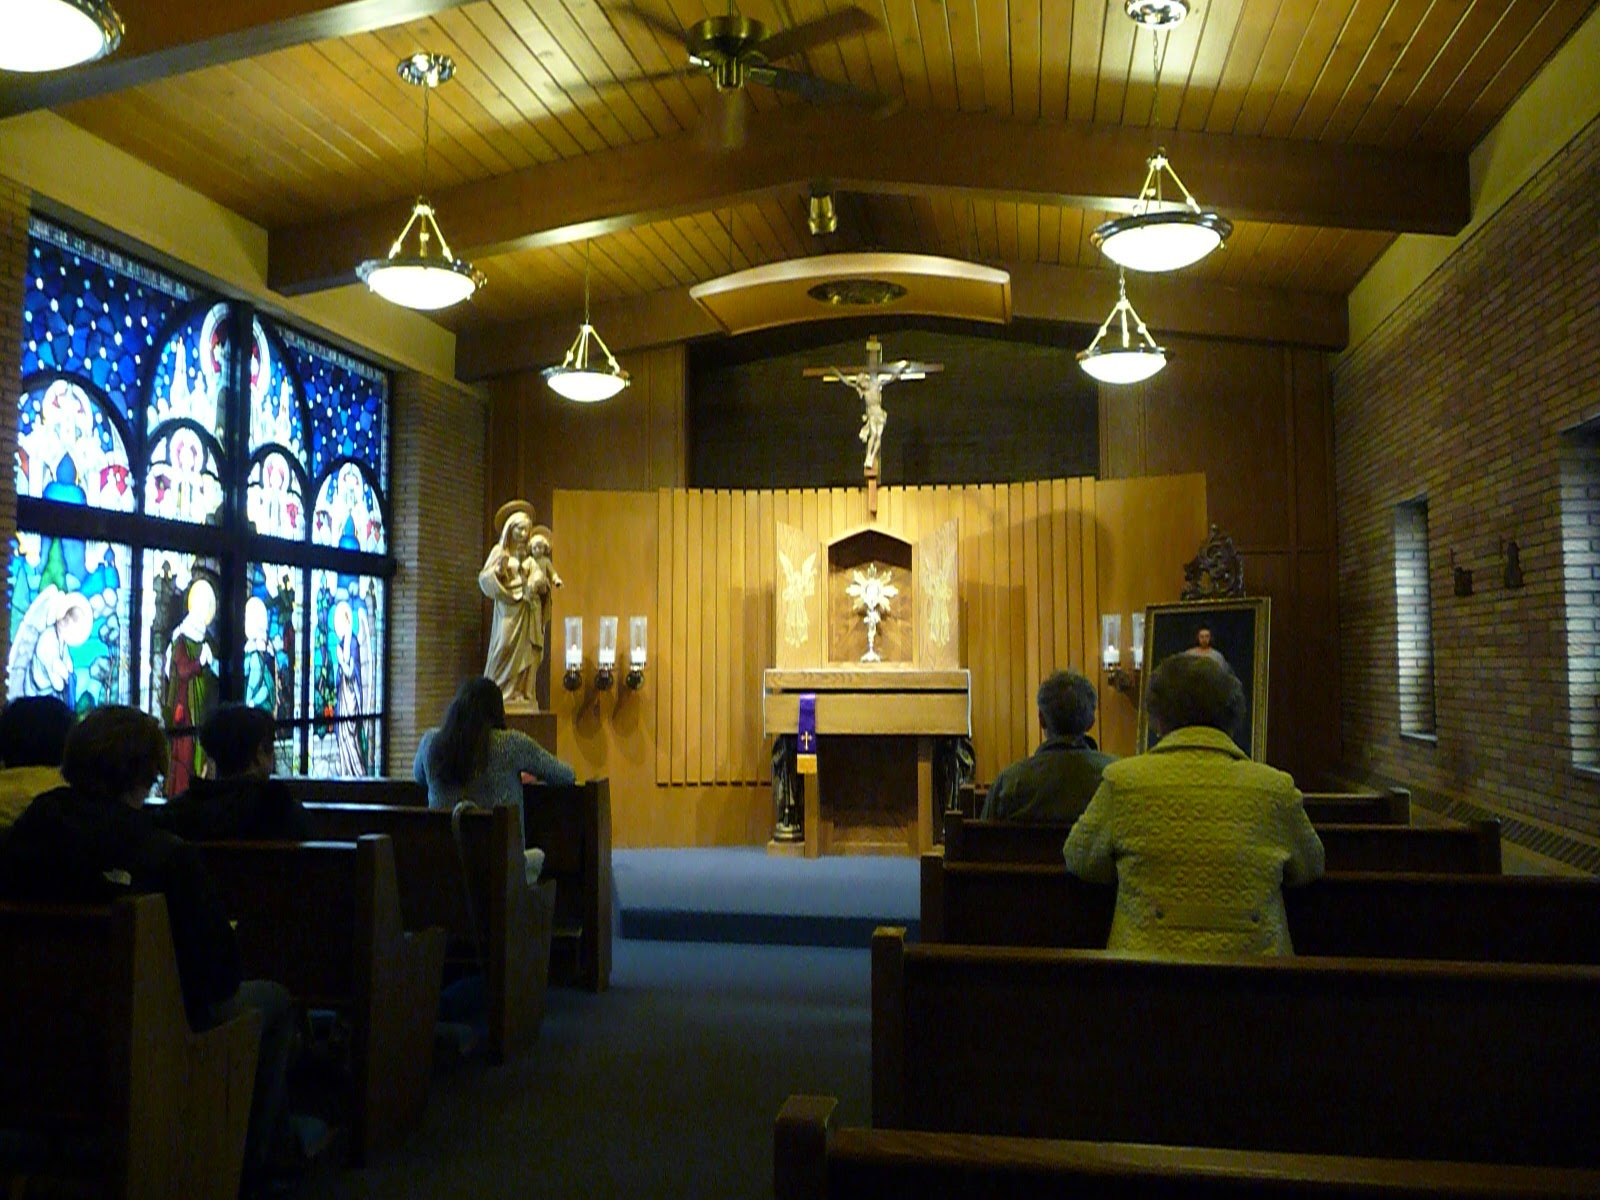 Perpetual Eucharistic Adoration Chapel, Visitation Parish, Elmhurst, IL